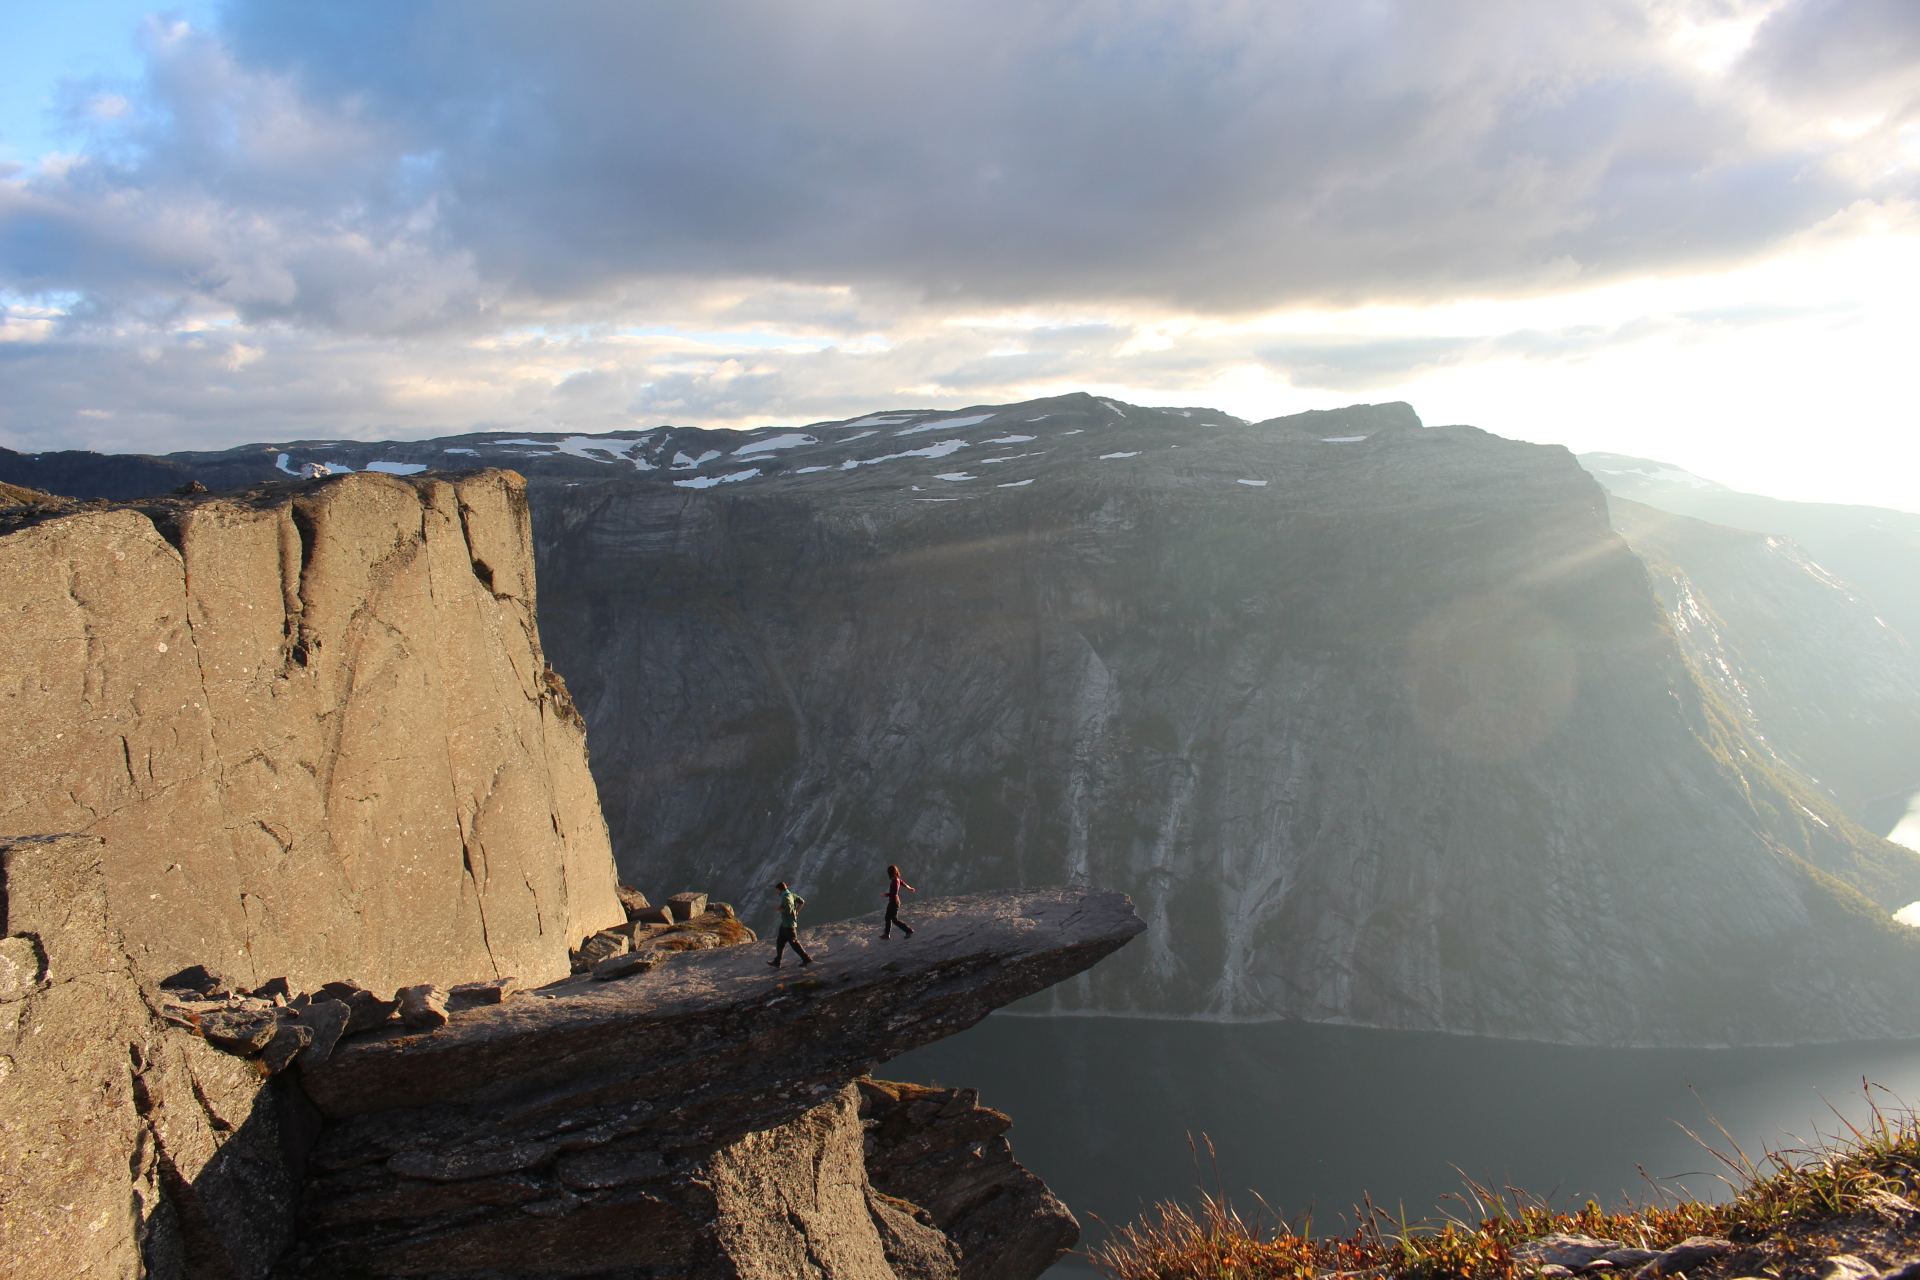 Norway: Climbing Trolltunga